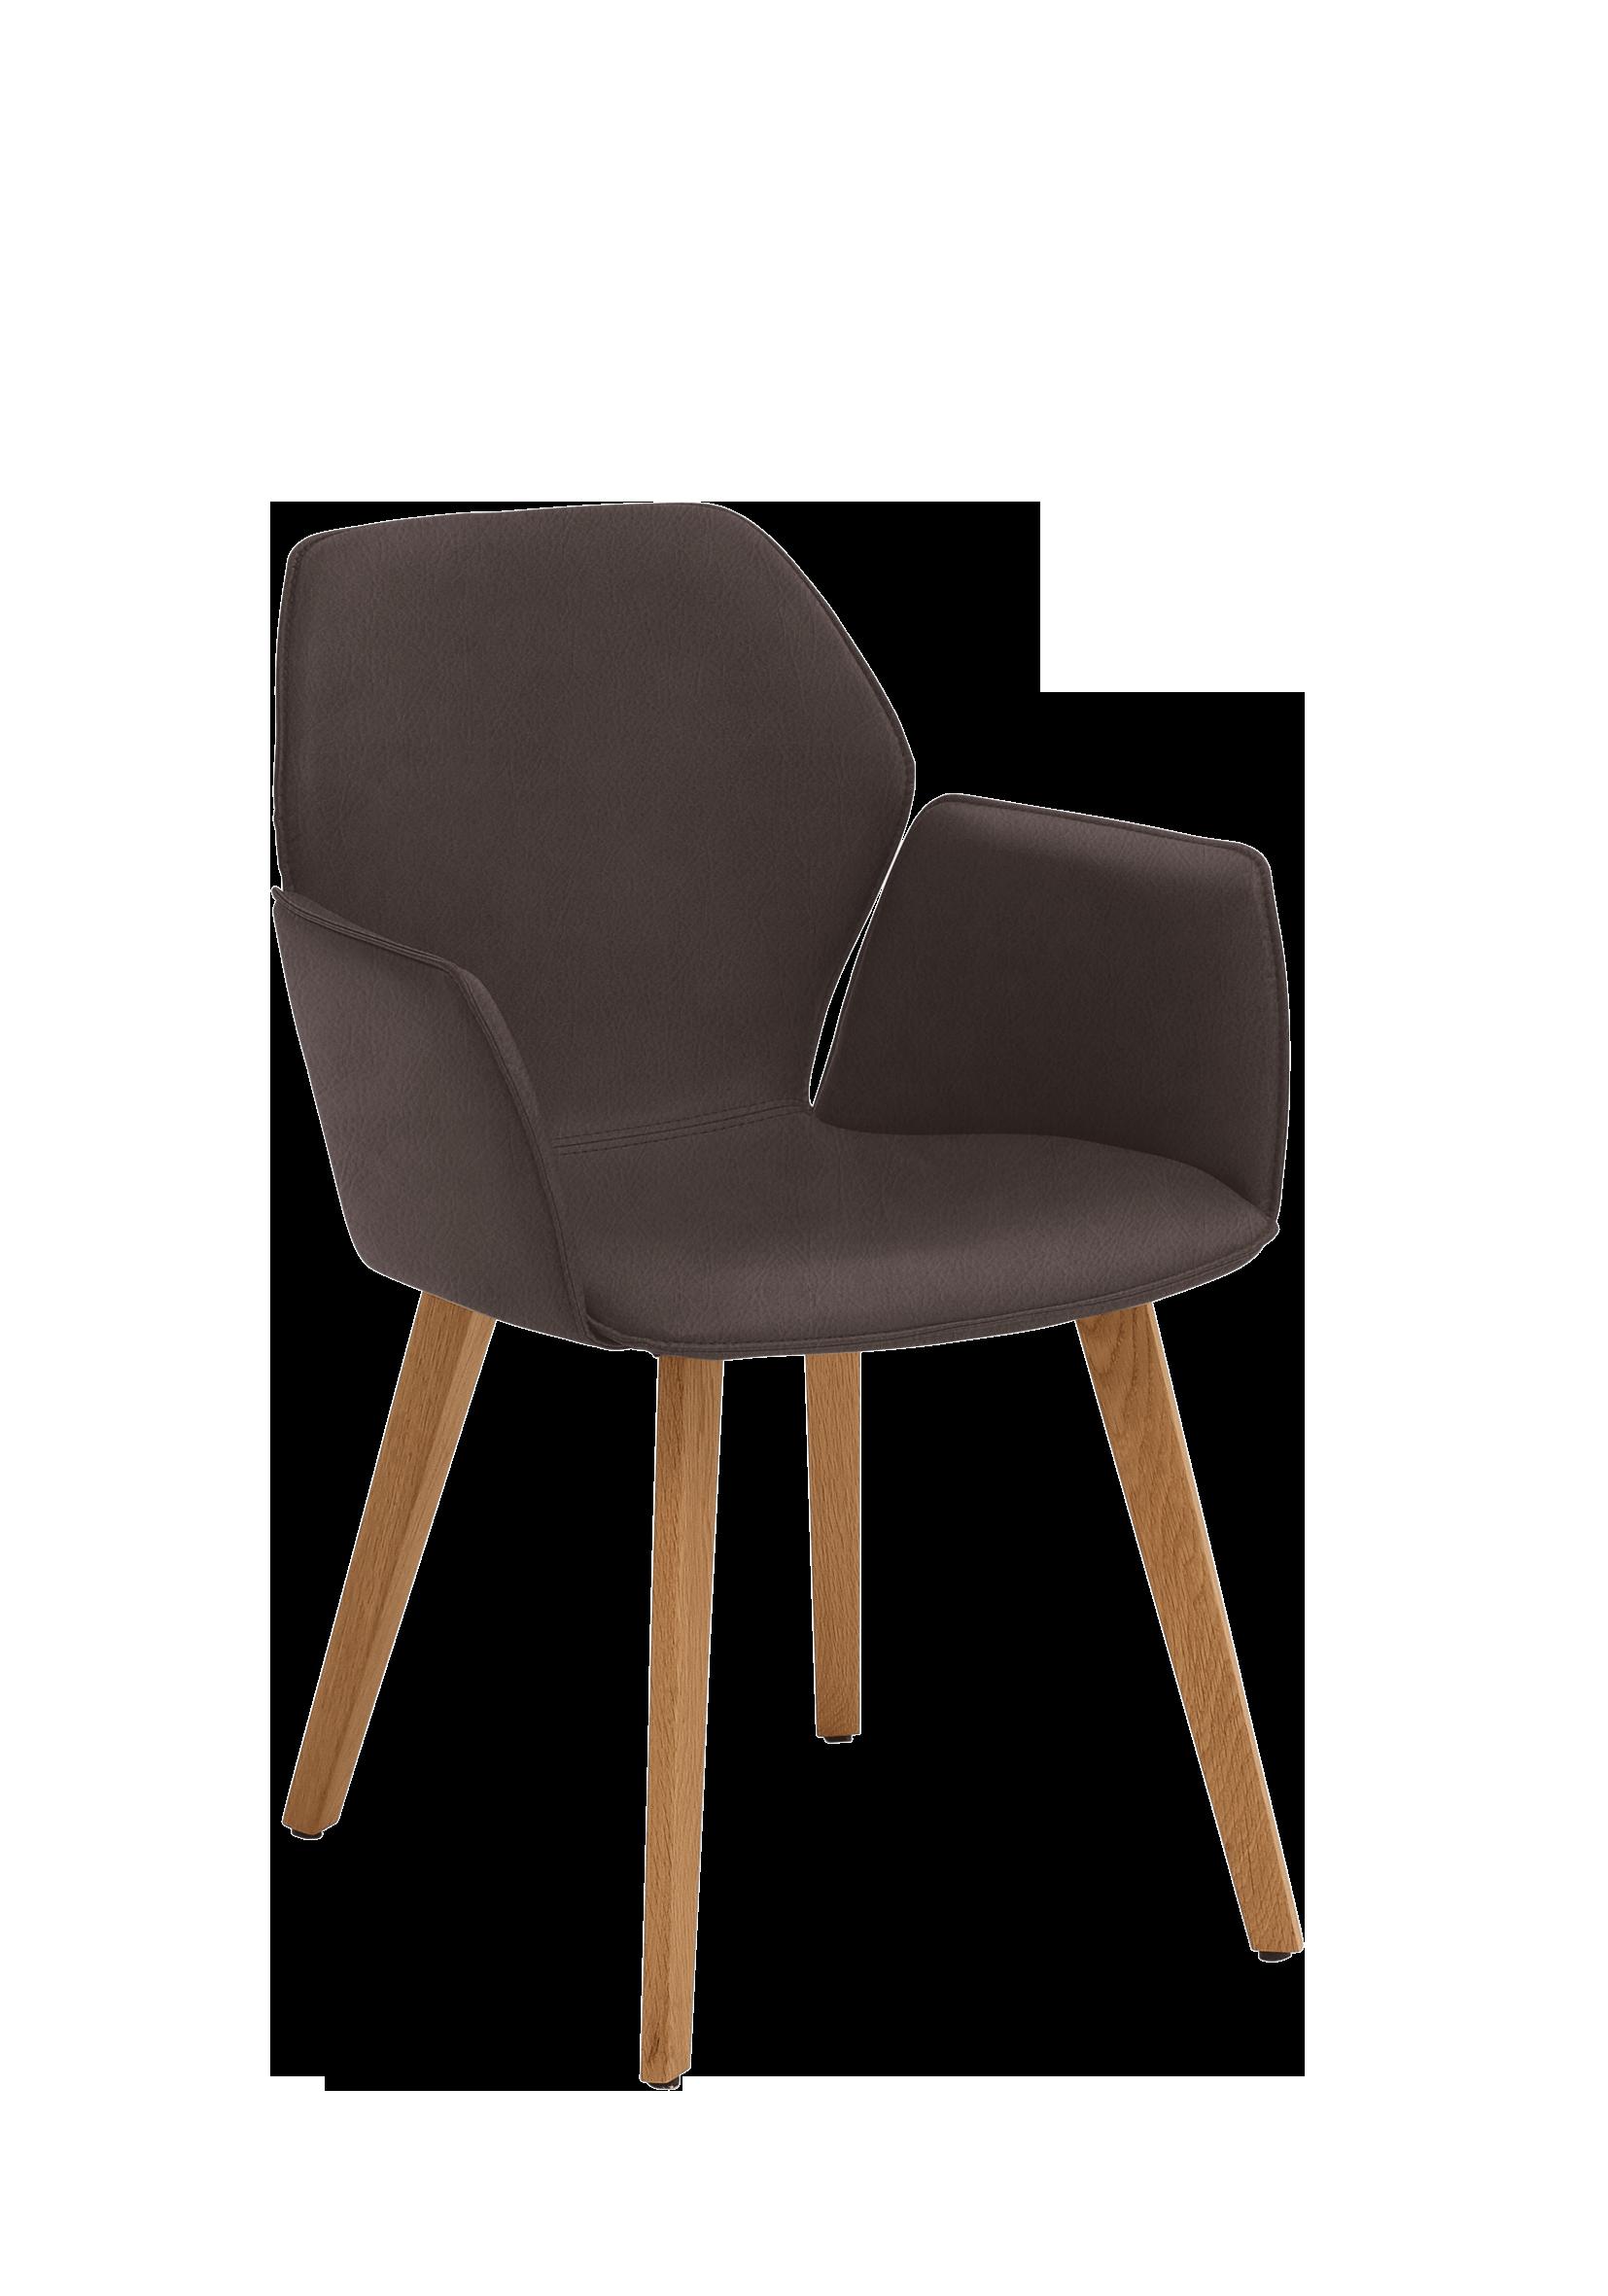 tonio esszimmerstuhl tonio tische st hle shop gallery m. Black Bedroom Furniture Sets. Home Design Ideas